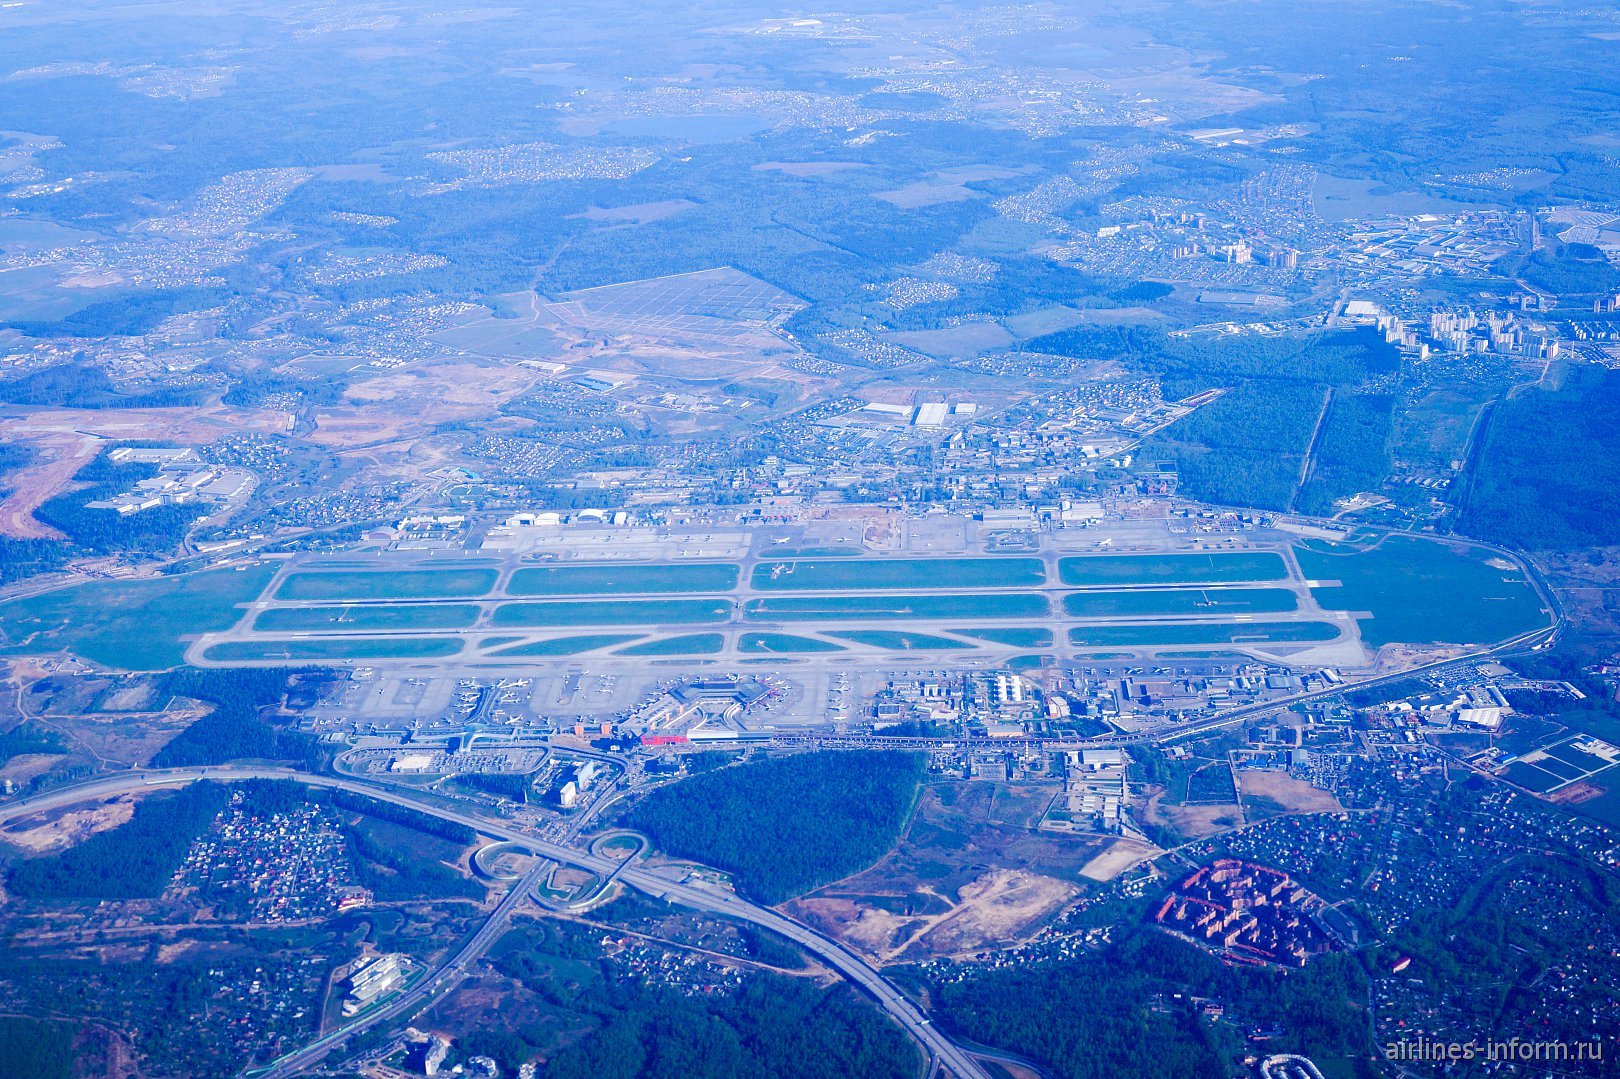 В Приморский край за 3000 р. Аэрофлотом. Омск-Москва, Airbus A320-214, VQ-BSI